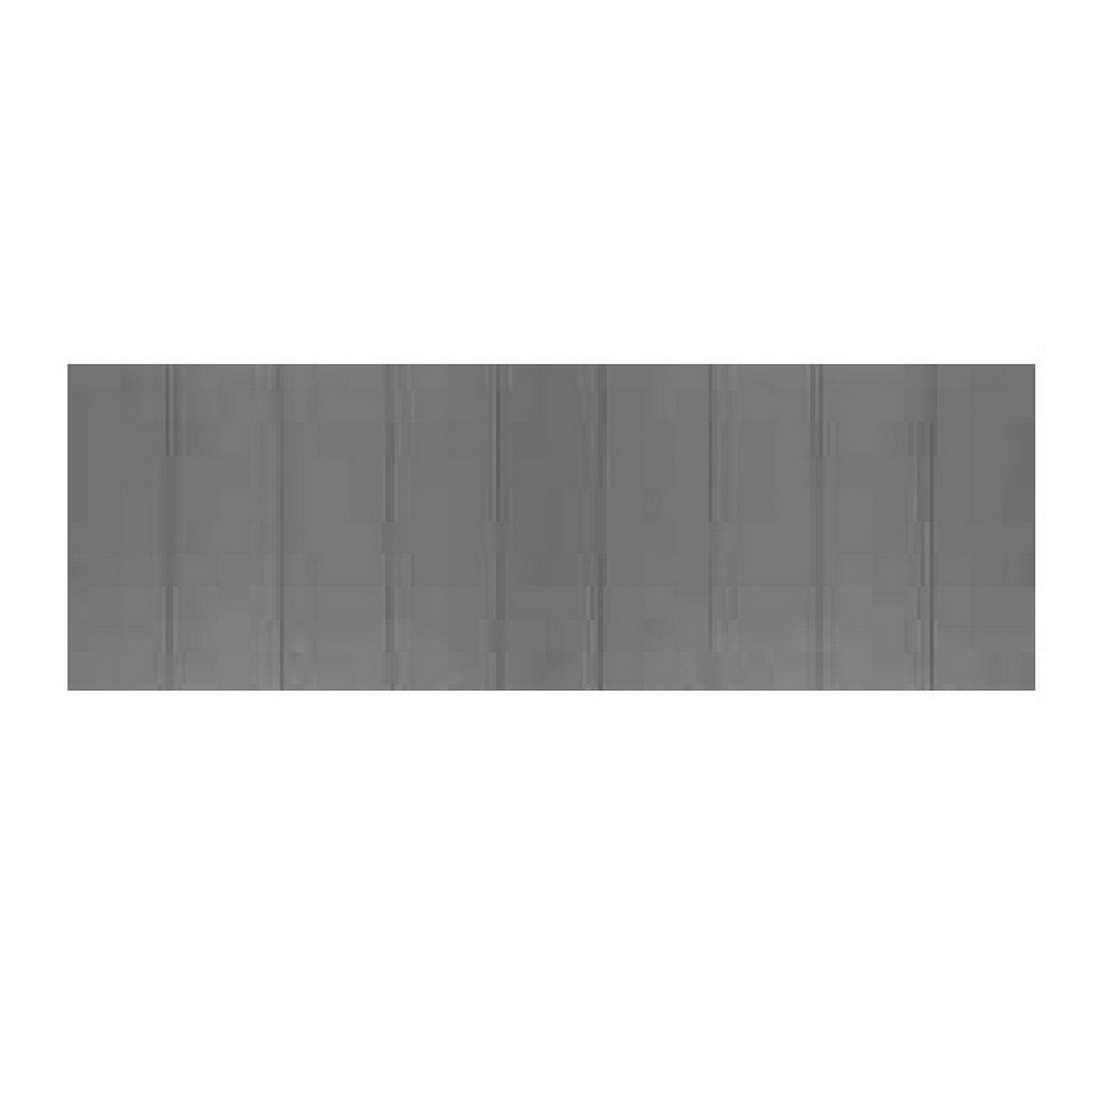 Axon Panel 133mm Grained 3000 x 1200 x 9mm